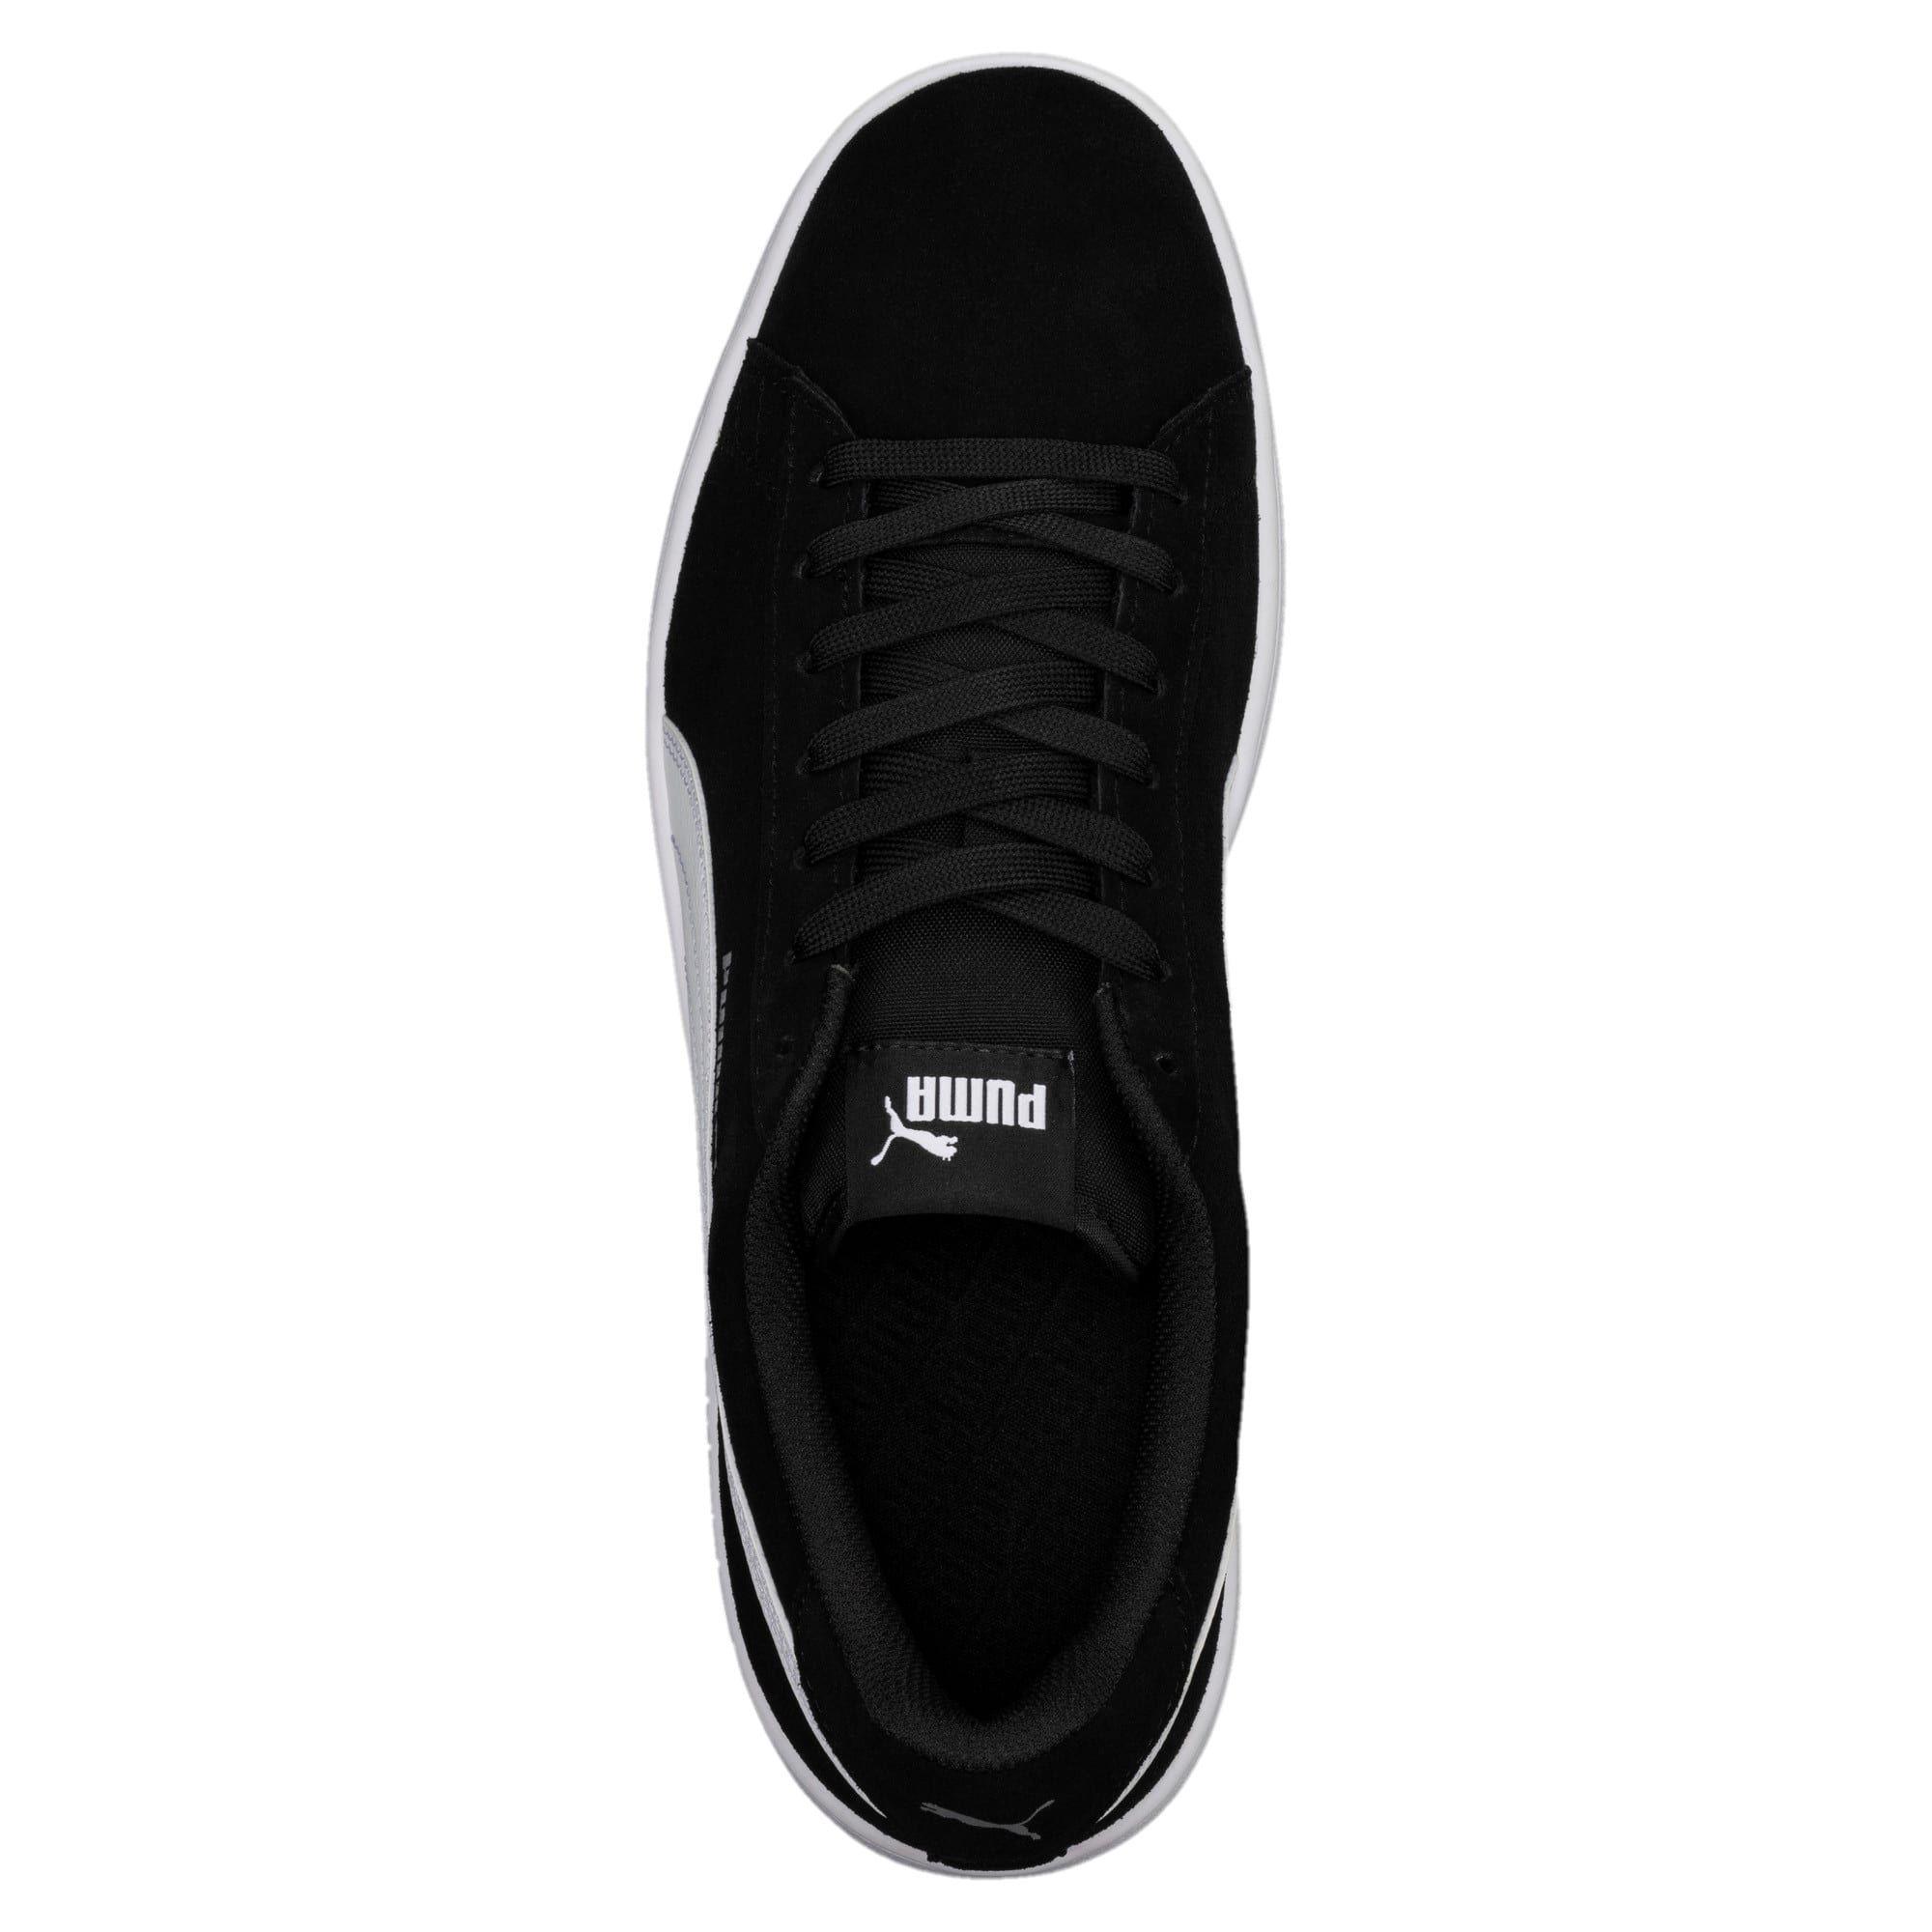 Basket Smash v2 | All black sneakers, Suede leather, Soft suede